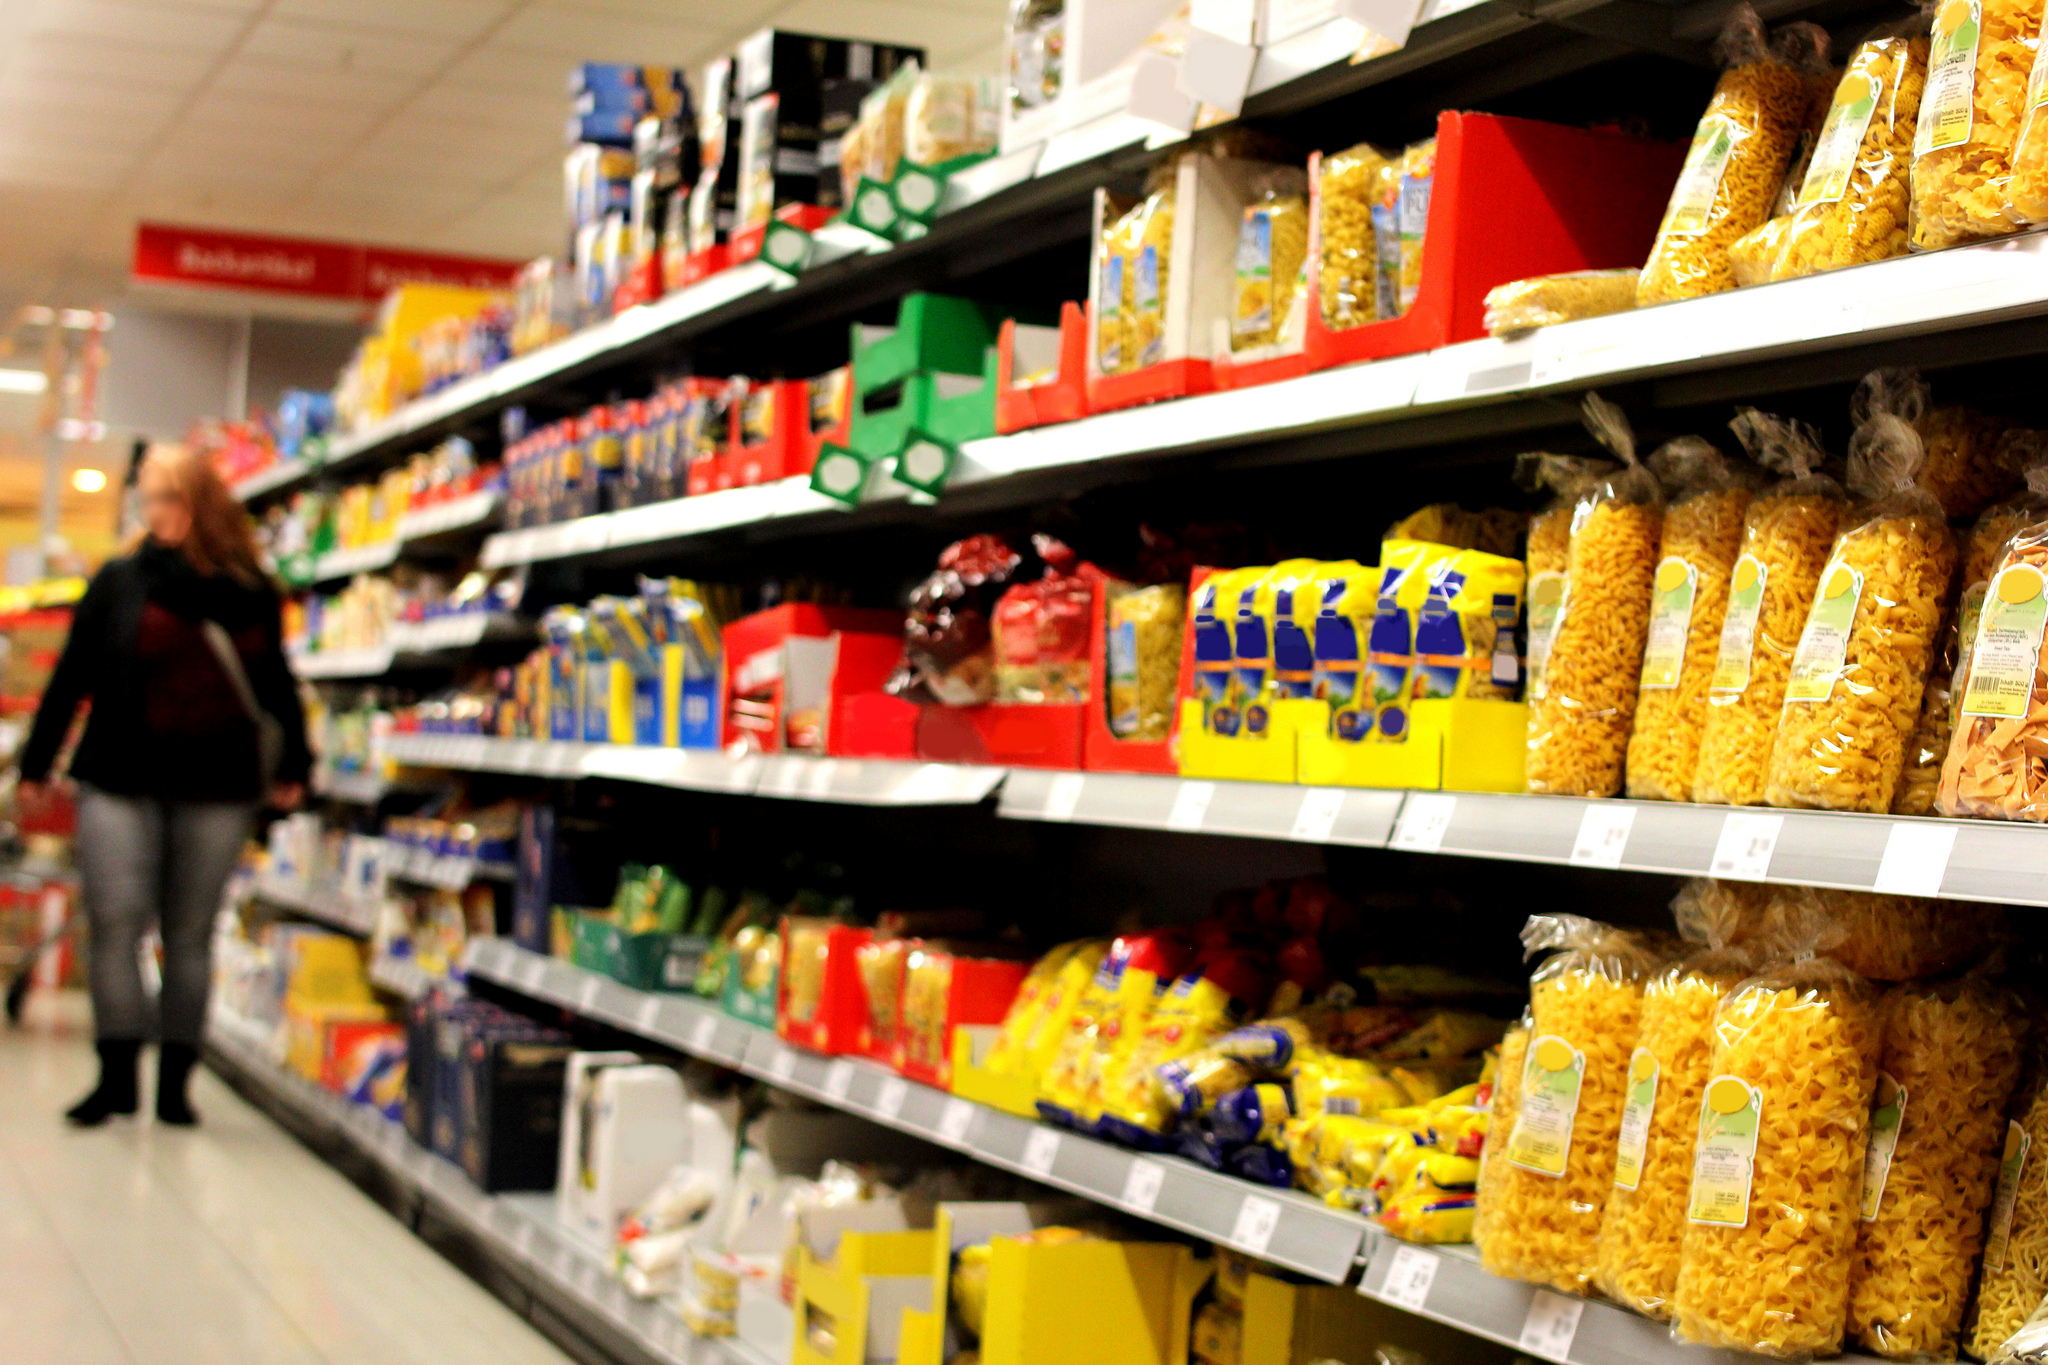 supermarkt-hq-flickr-com-christian-schnettelker-cc-by-2-0